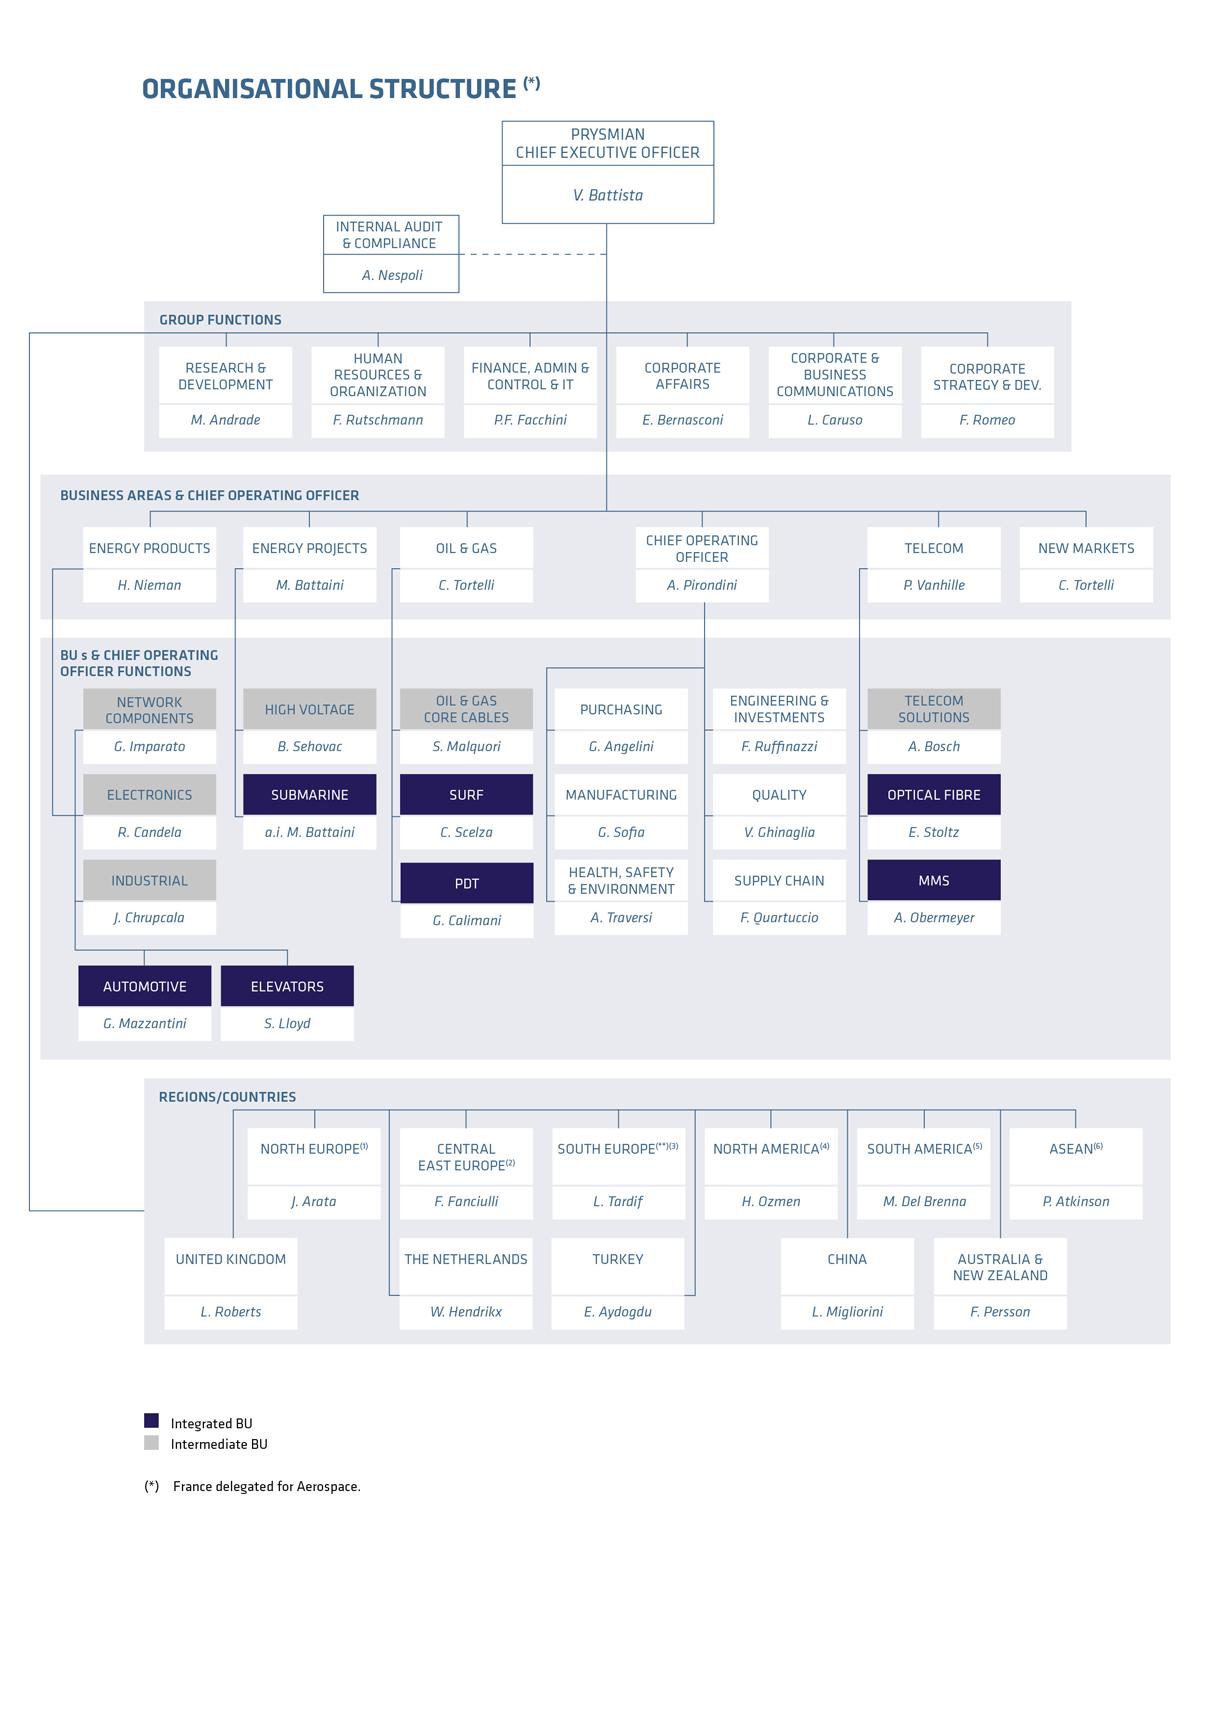 en about us organizational structure image - World Vision Organizational Structure